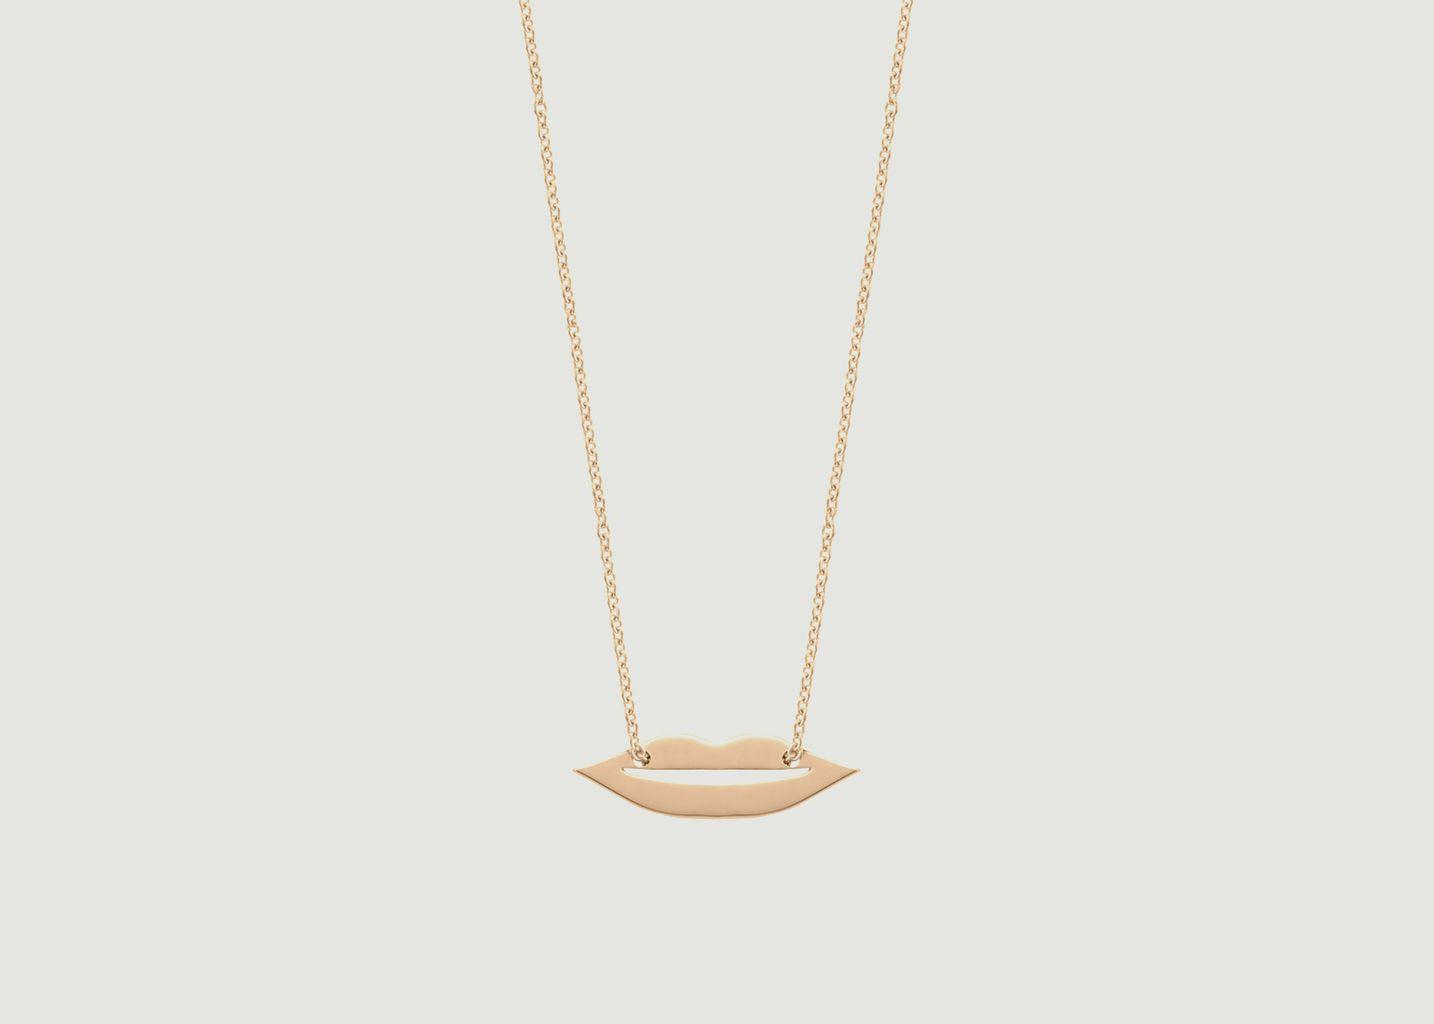 Collier chaîne et pendentif en or rose Mini French Kiss - Ginette NY